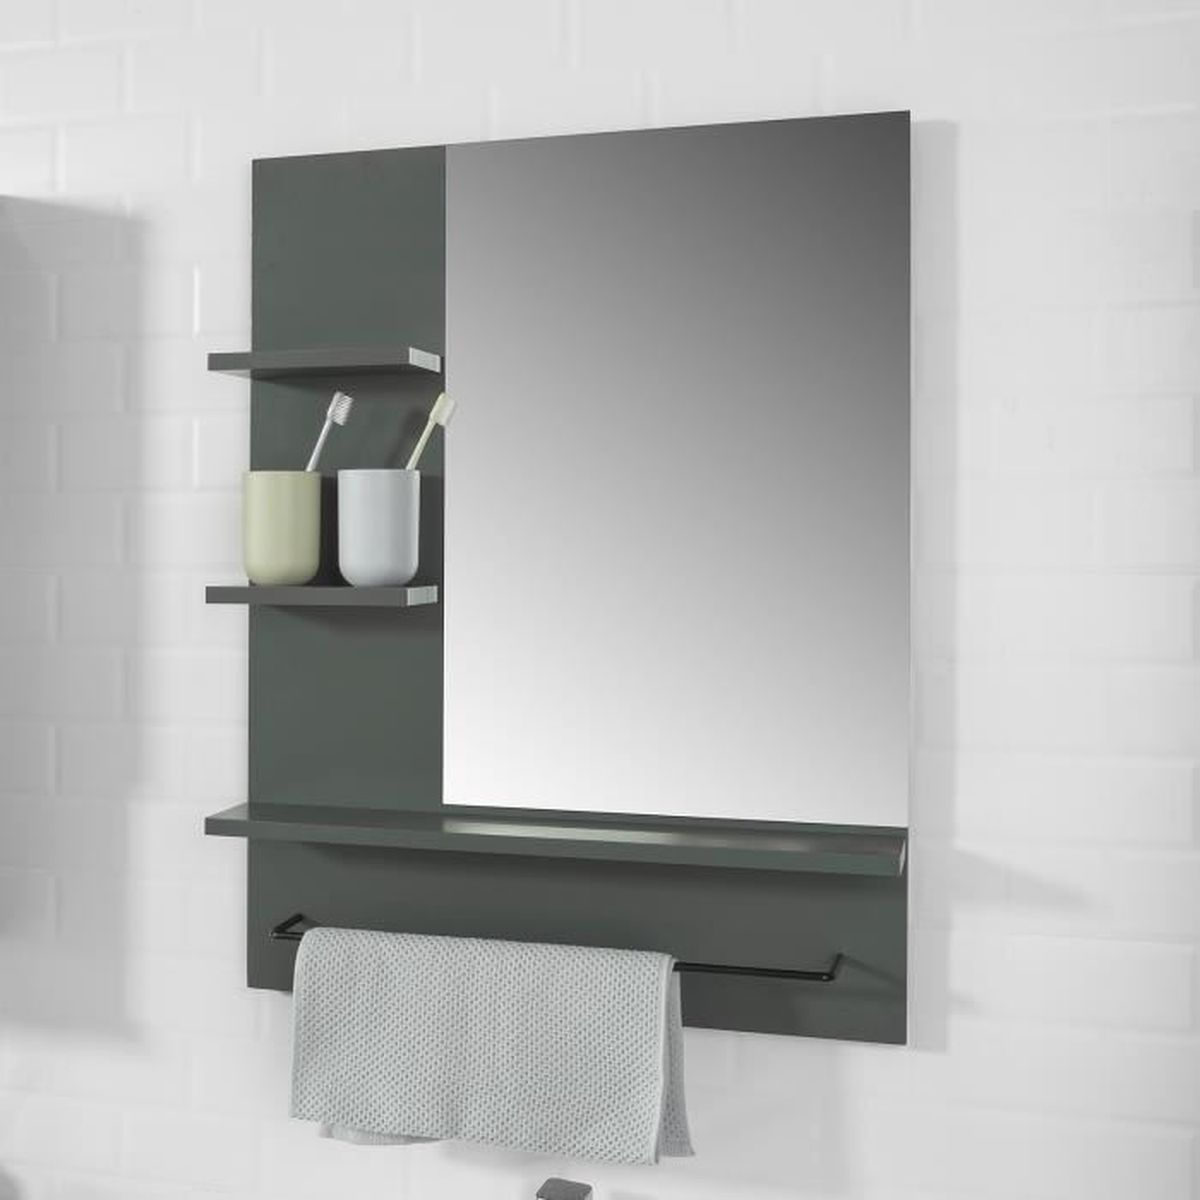 Meuble Haut Salle De Bain Avec Miroir sobuy® bzr23-dg miroir avec porte-serviettes miroir mural